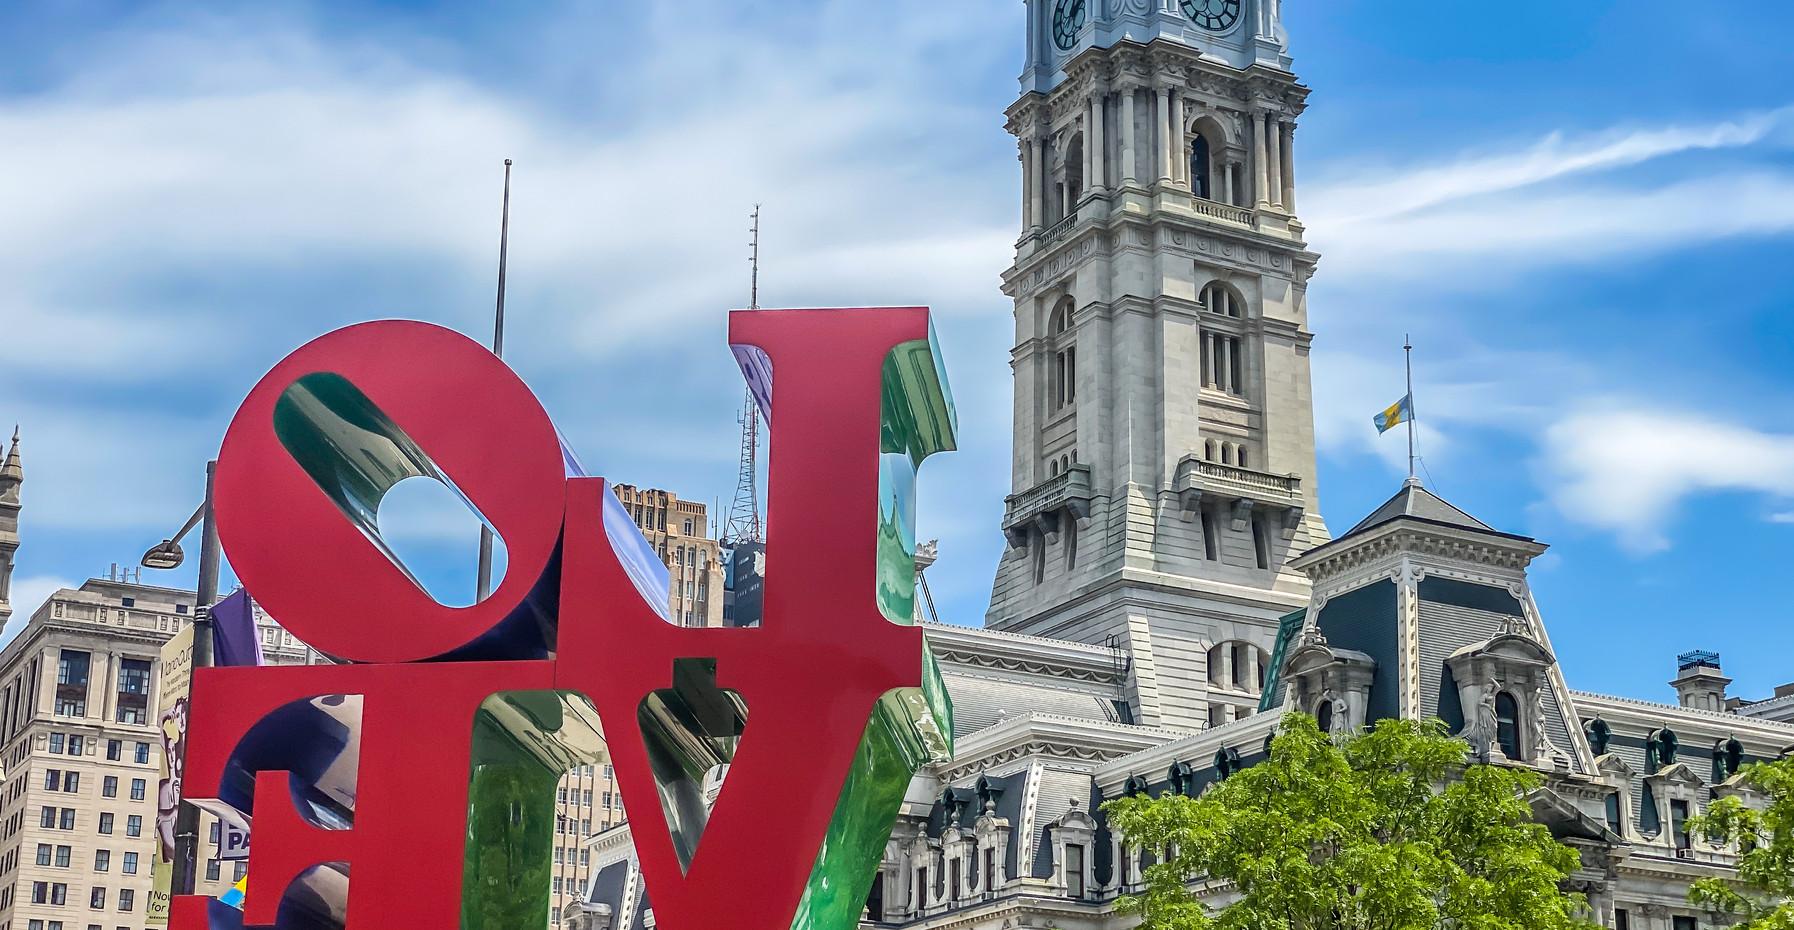 Philadelphia Love Statue